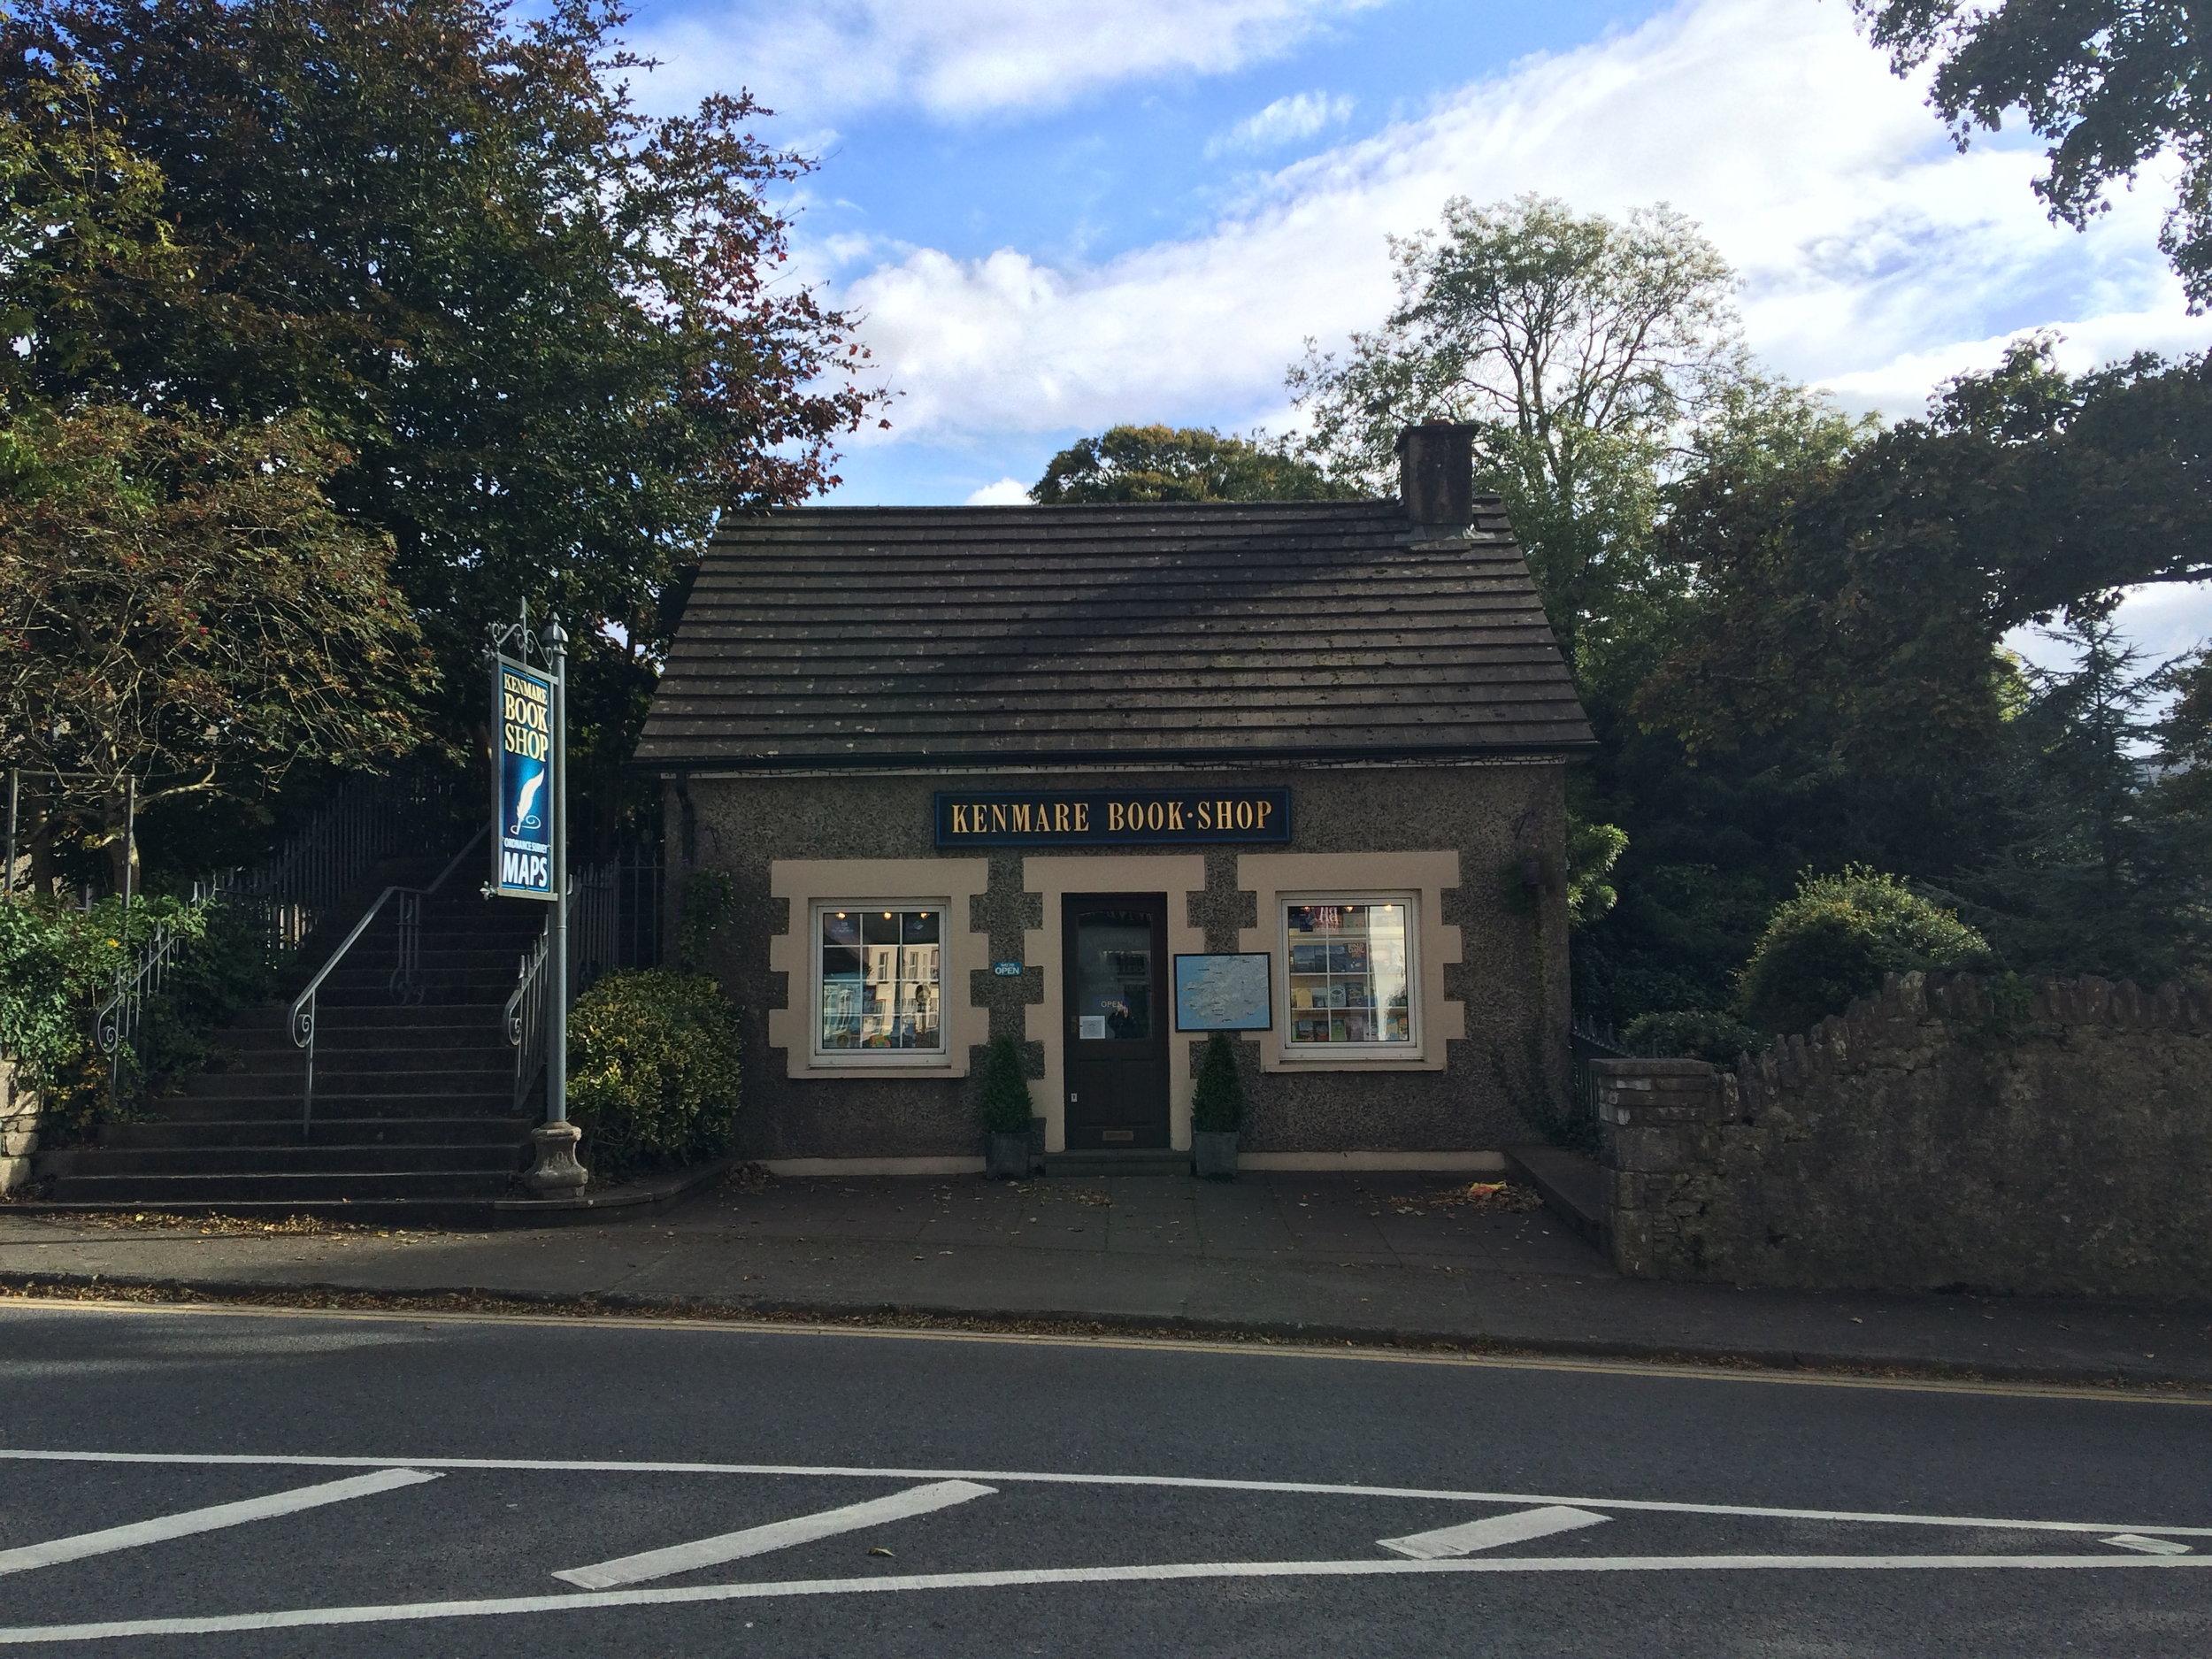 kenmare book shop, ireland.jpg